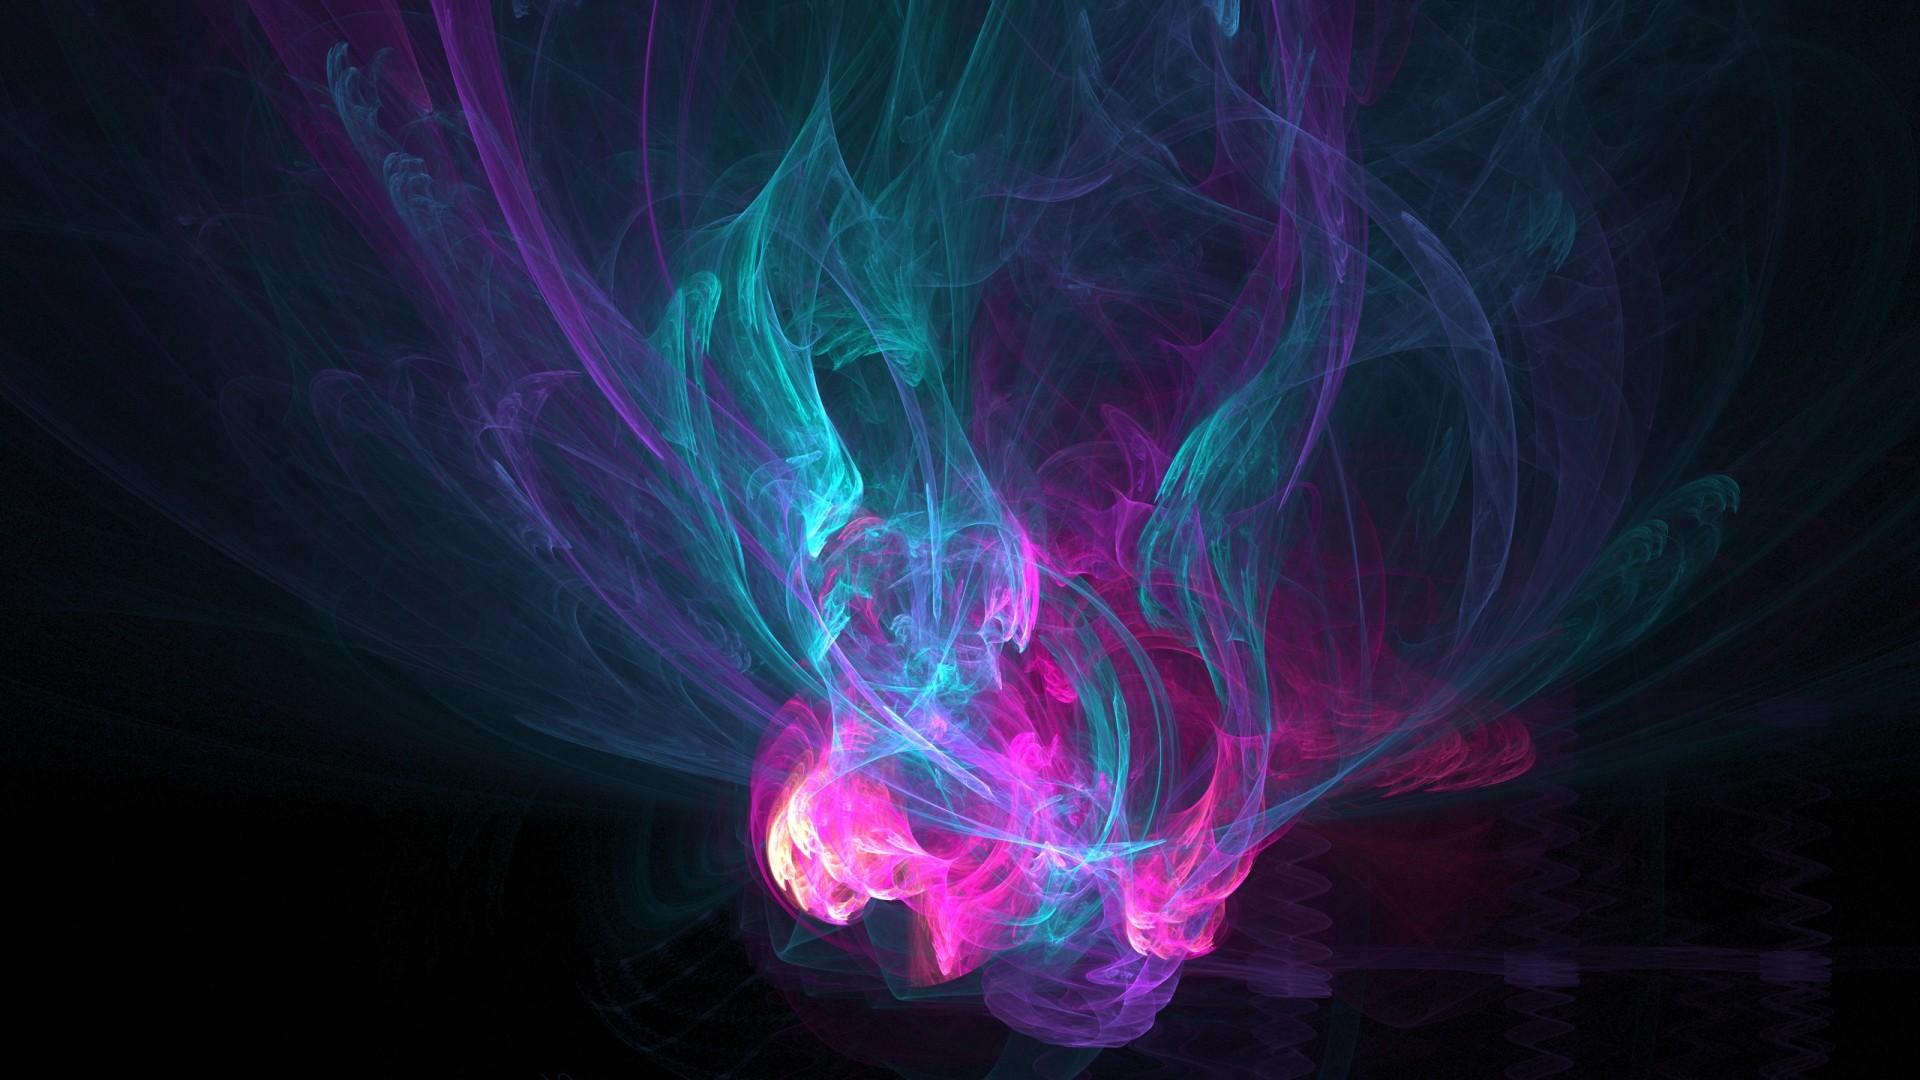 Colorful Smoke Abstract HD desktop wallpaper, Smoke wallpaper – Abstract no.